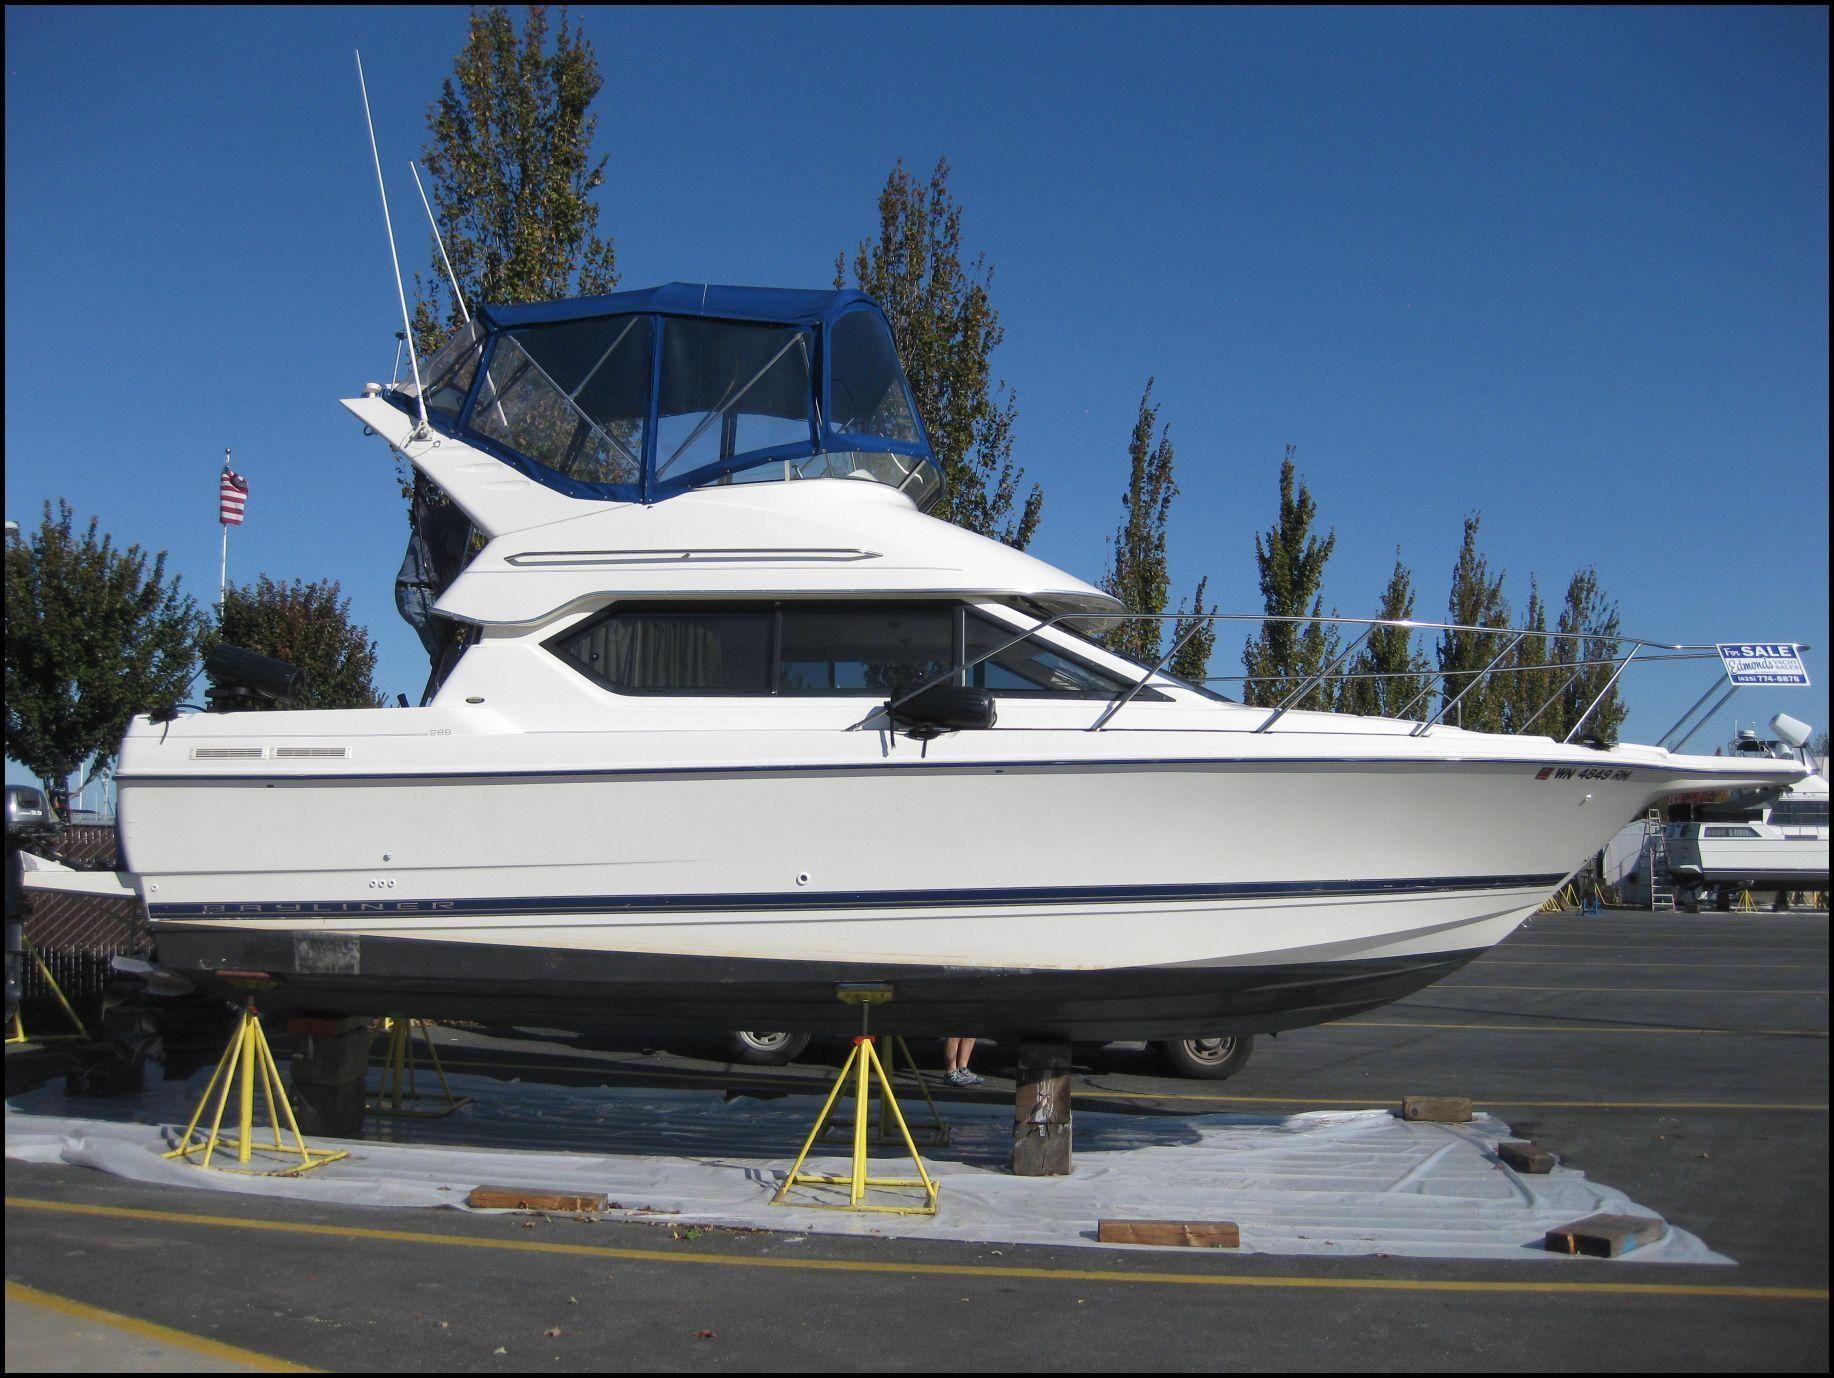 Edmonds (WA) United States  City new picture : 2003 Bayliner 2858 Ciera Power Boat For Sale www.yachtworld.com